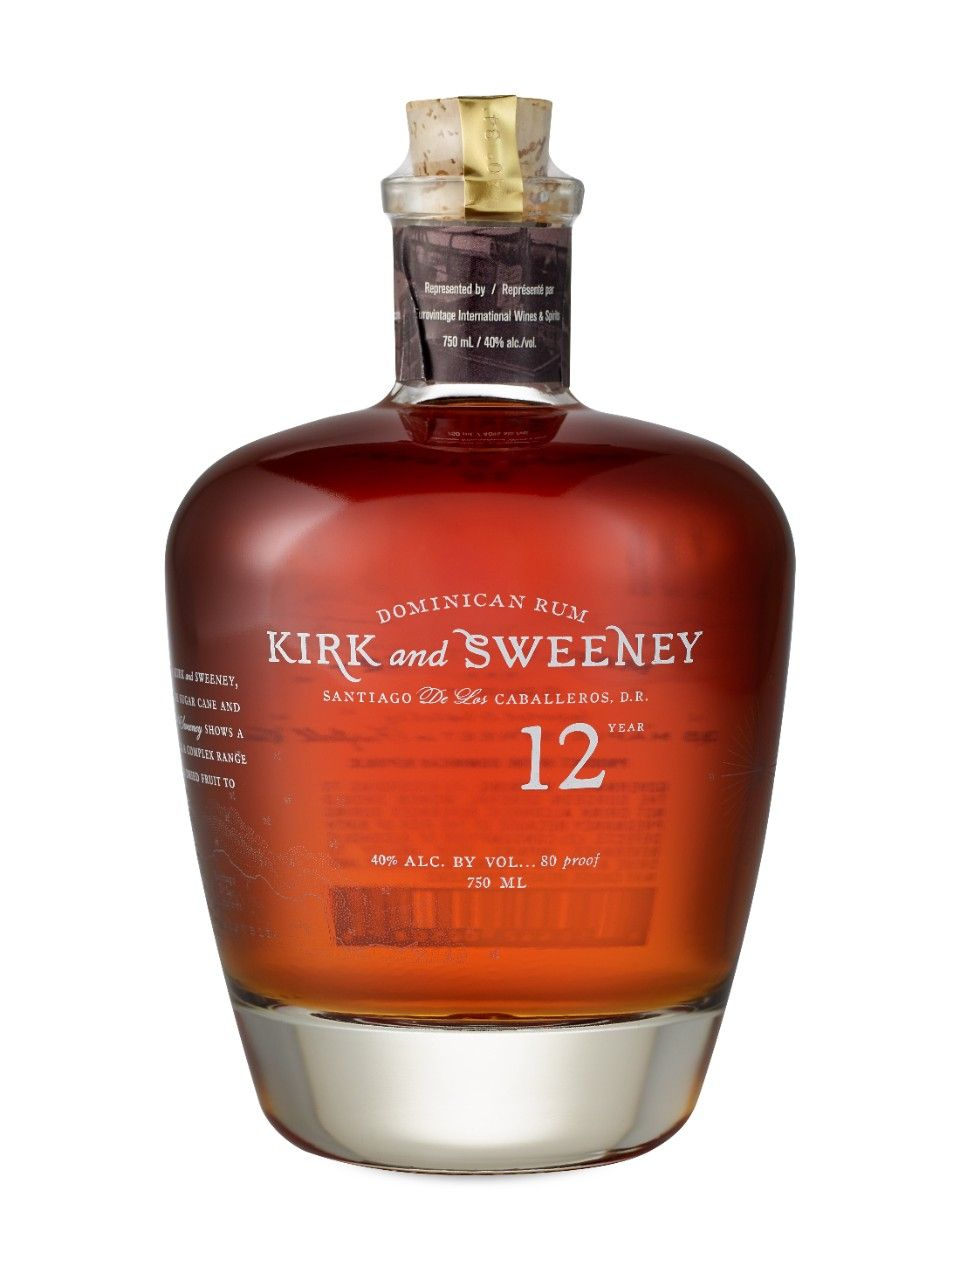 Kirk And Sweeney 12 Year Old Dominican Rum Dominican Rum Rum Booze